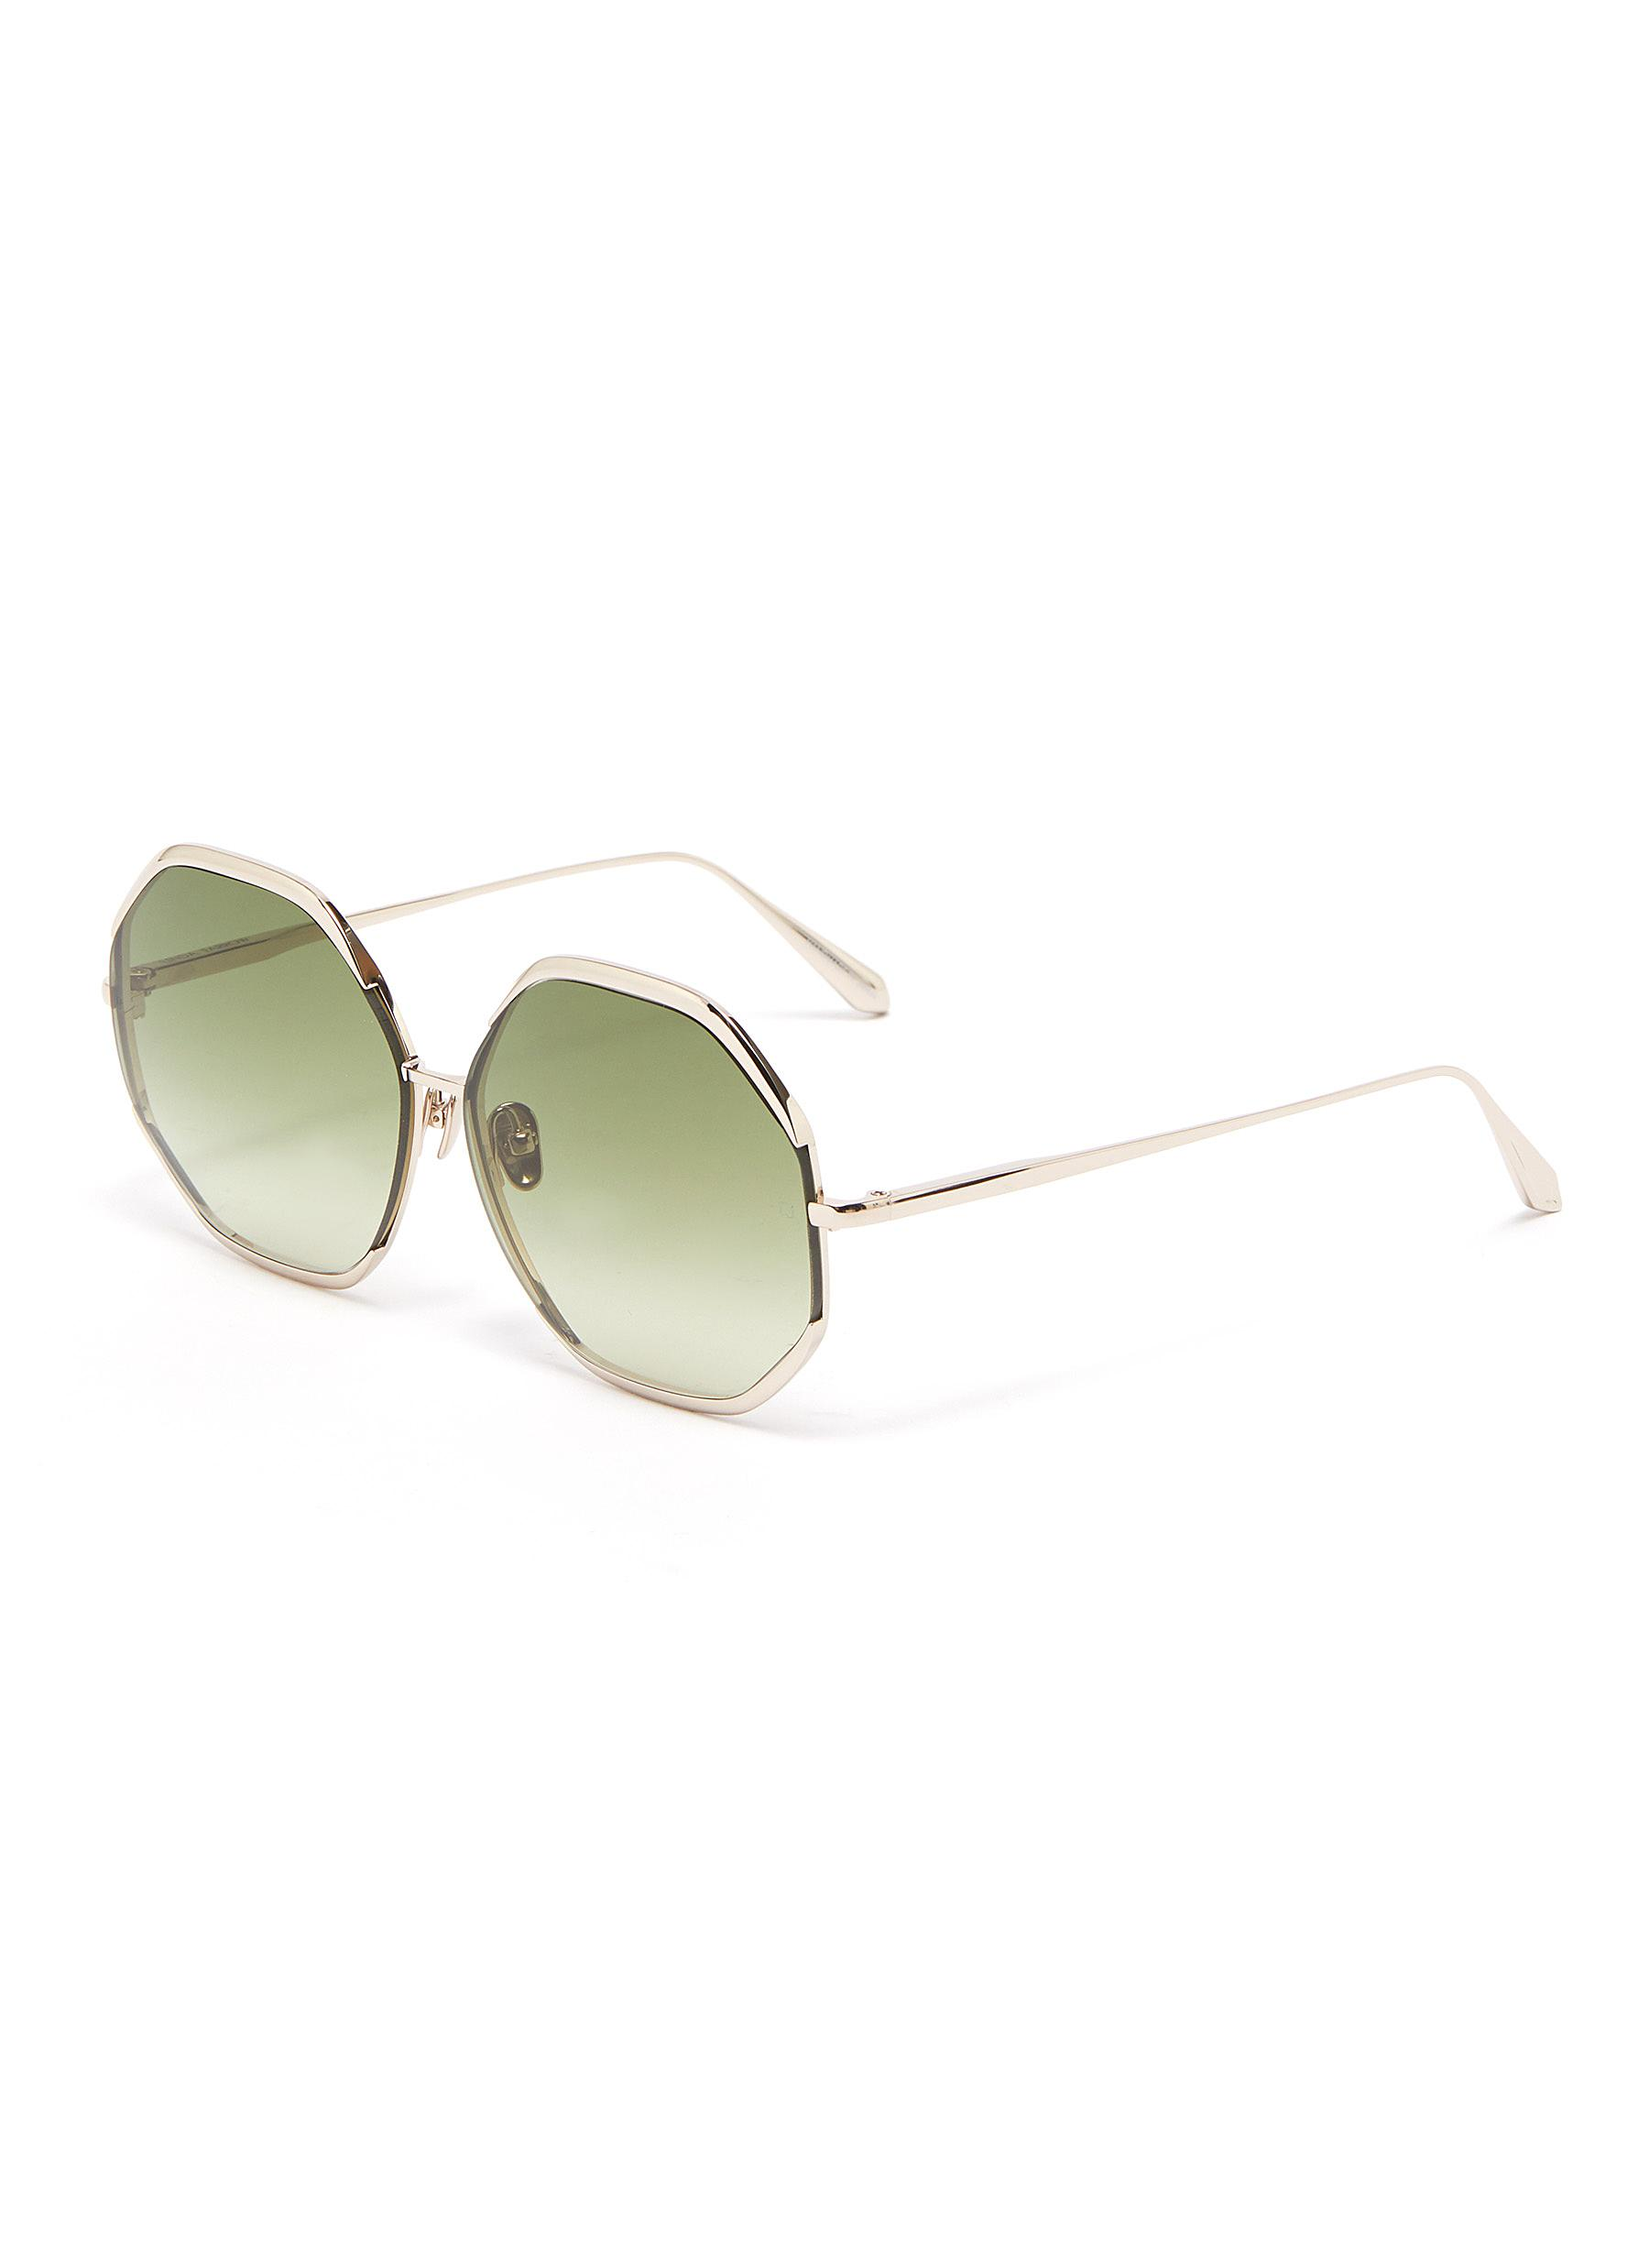 Camila' Metal Hexagonal Frame Sunglasses - LINDA FARROW VINTAGE - Modalova